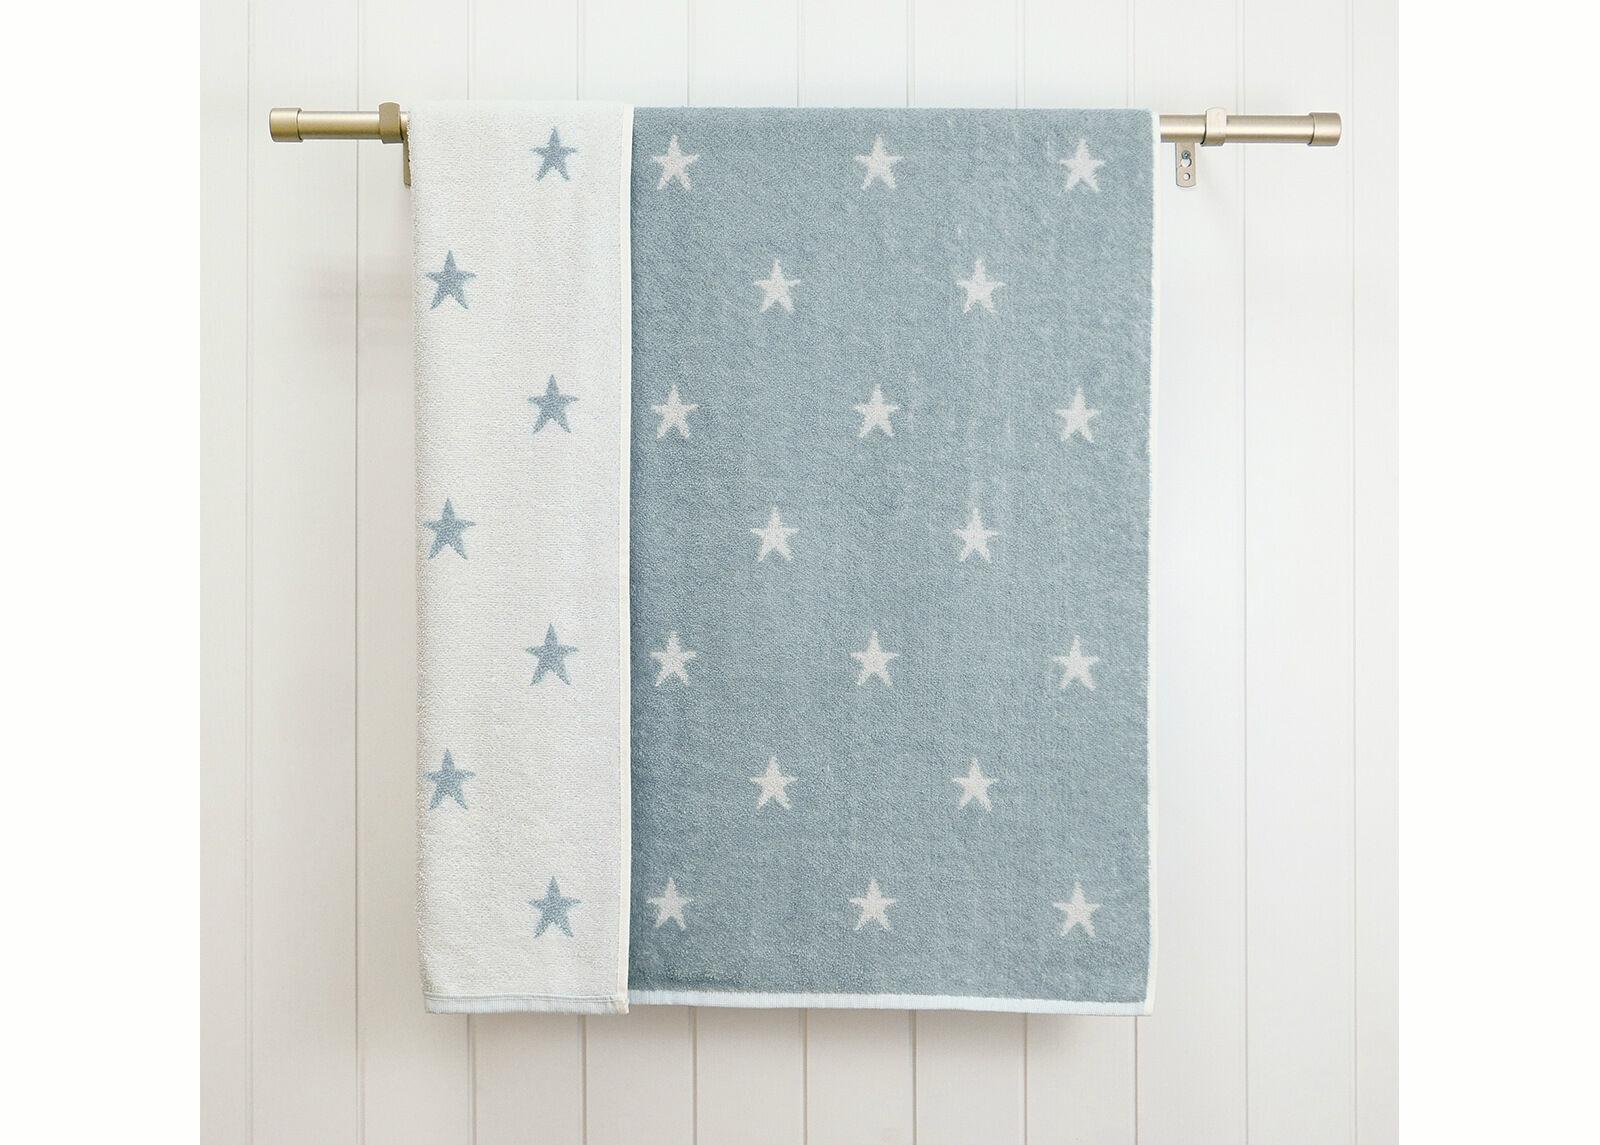 ARDENZA BABY Froteepyyhe Stars 70x120 cm, farkunsininen